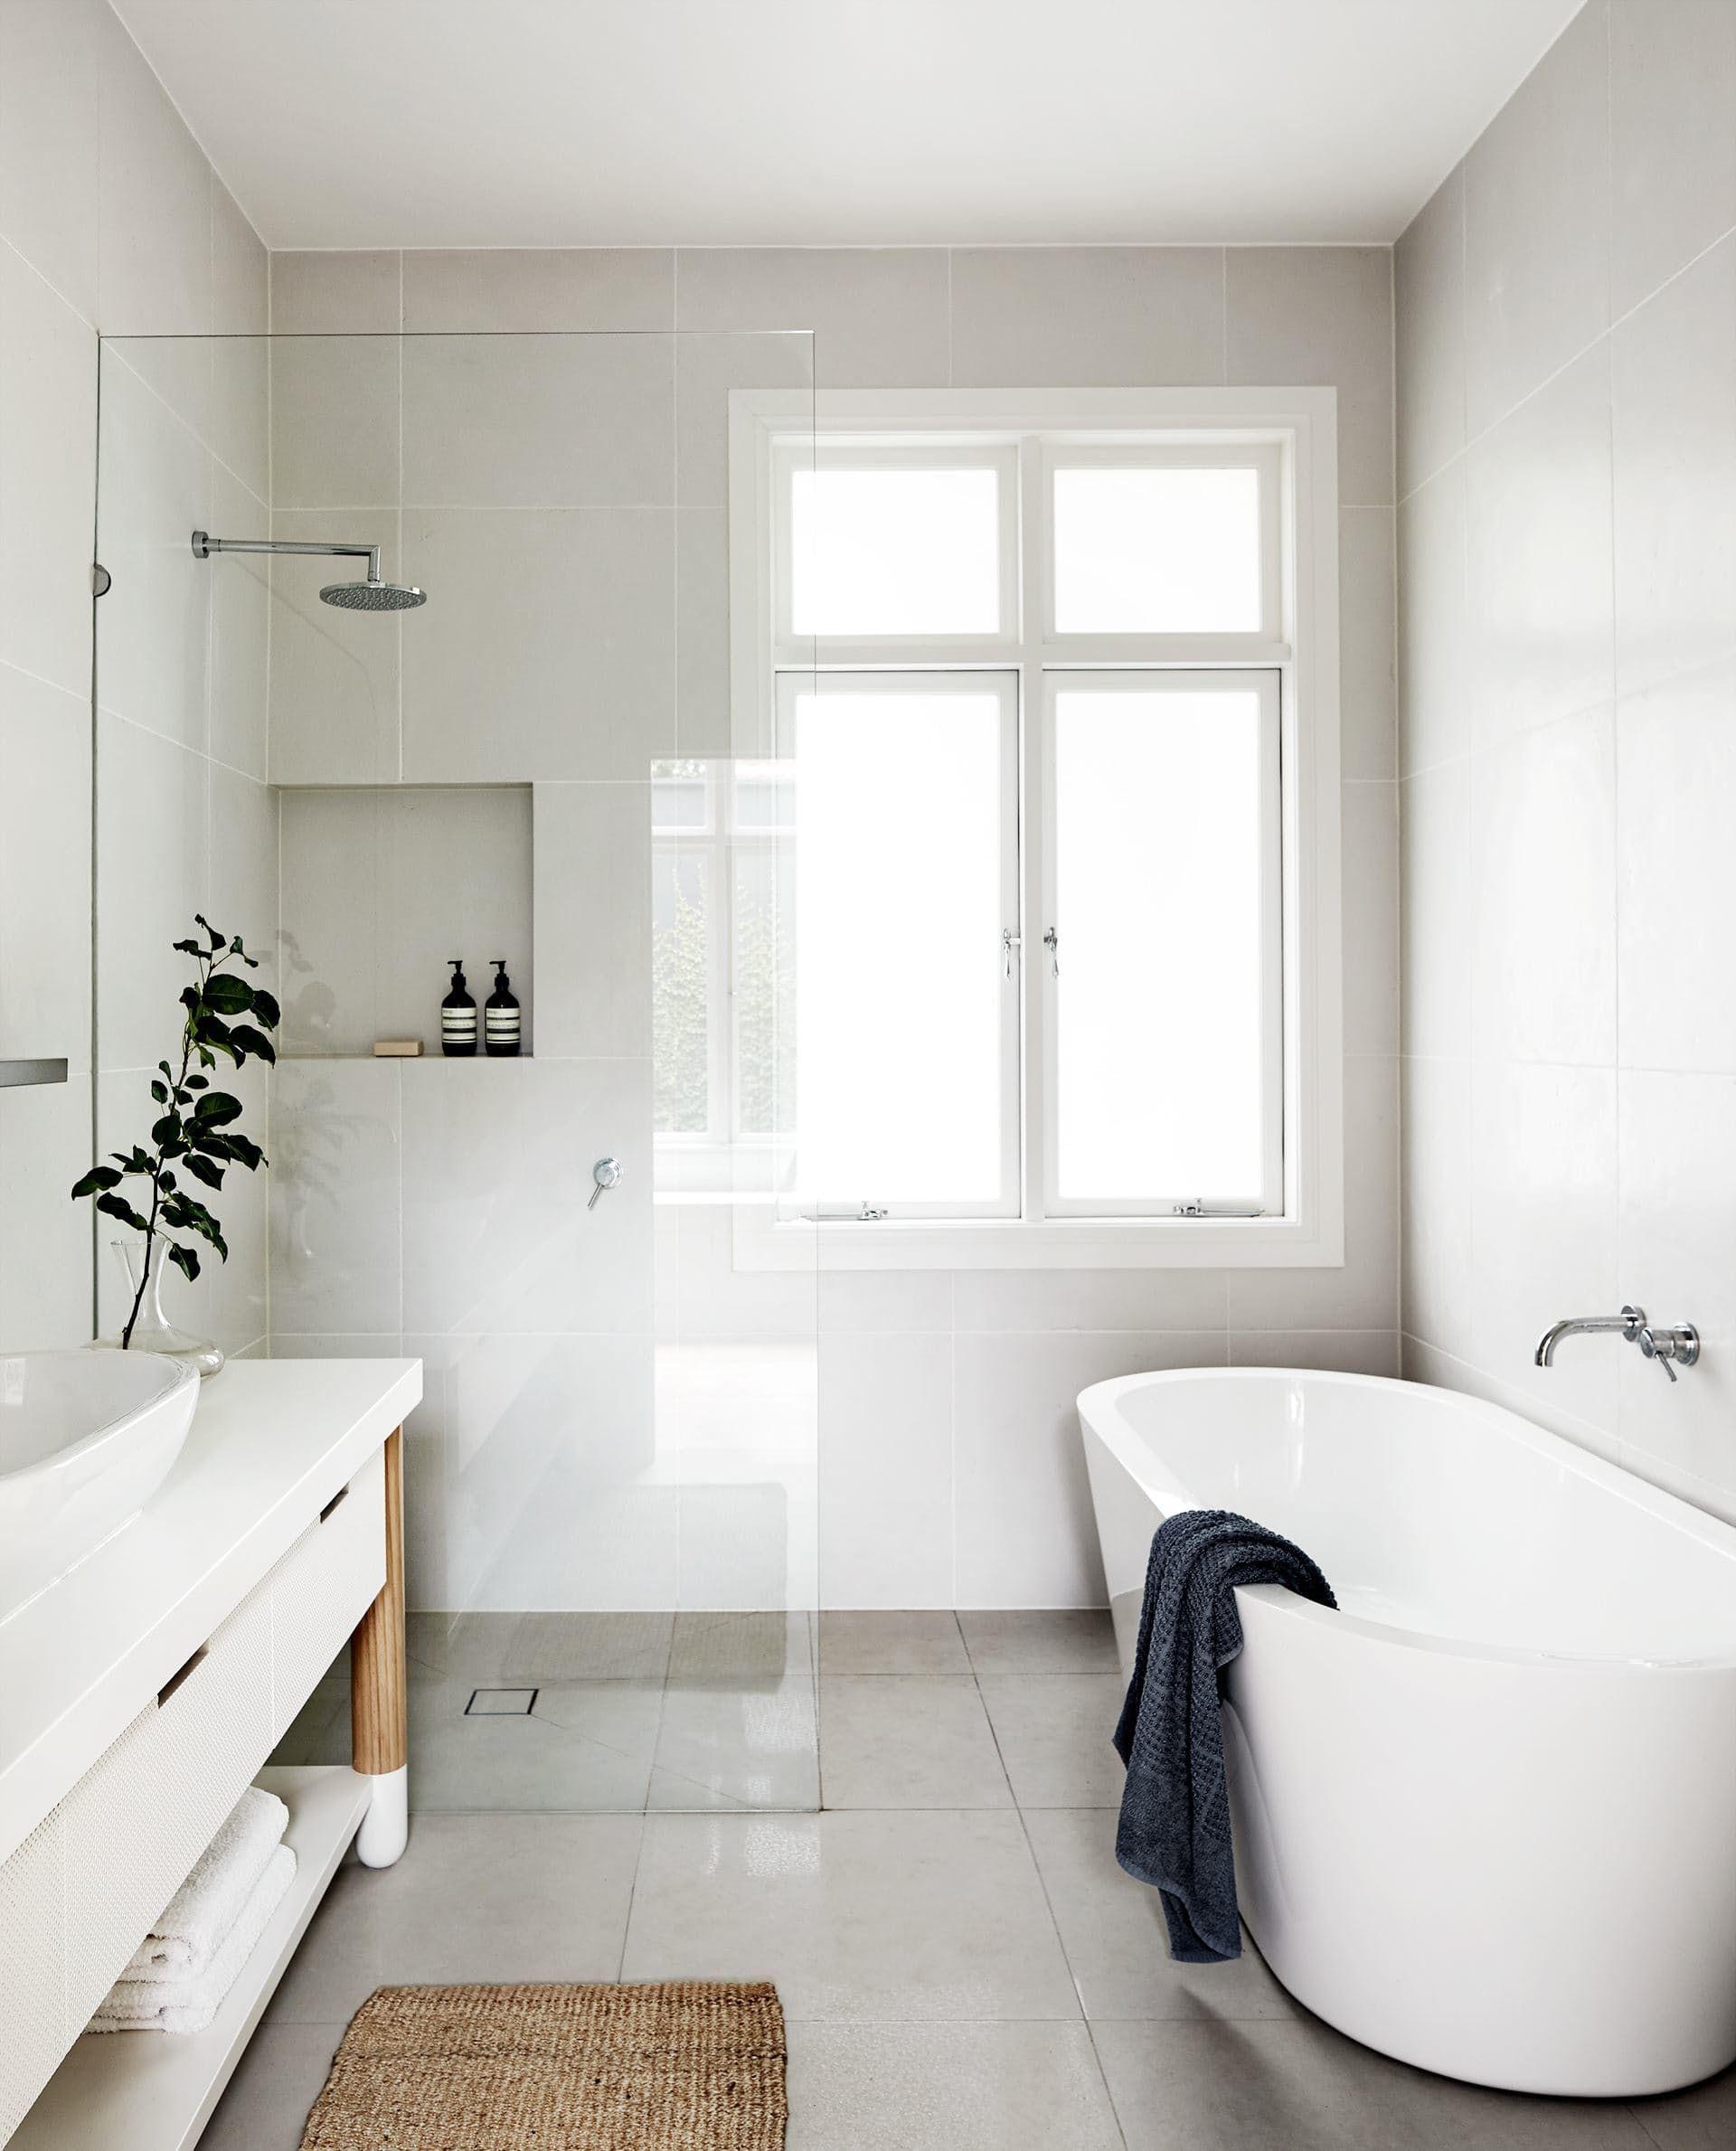 beautiful inspiring bathroom designs for the soul gallery bathroom rh pinterest com